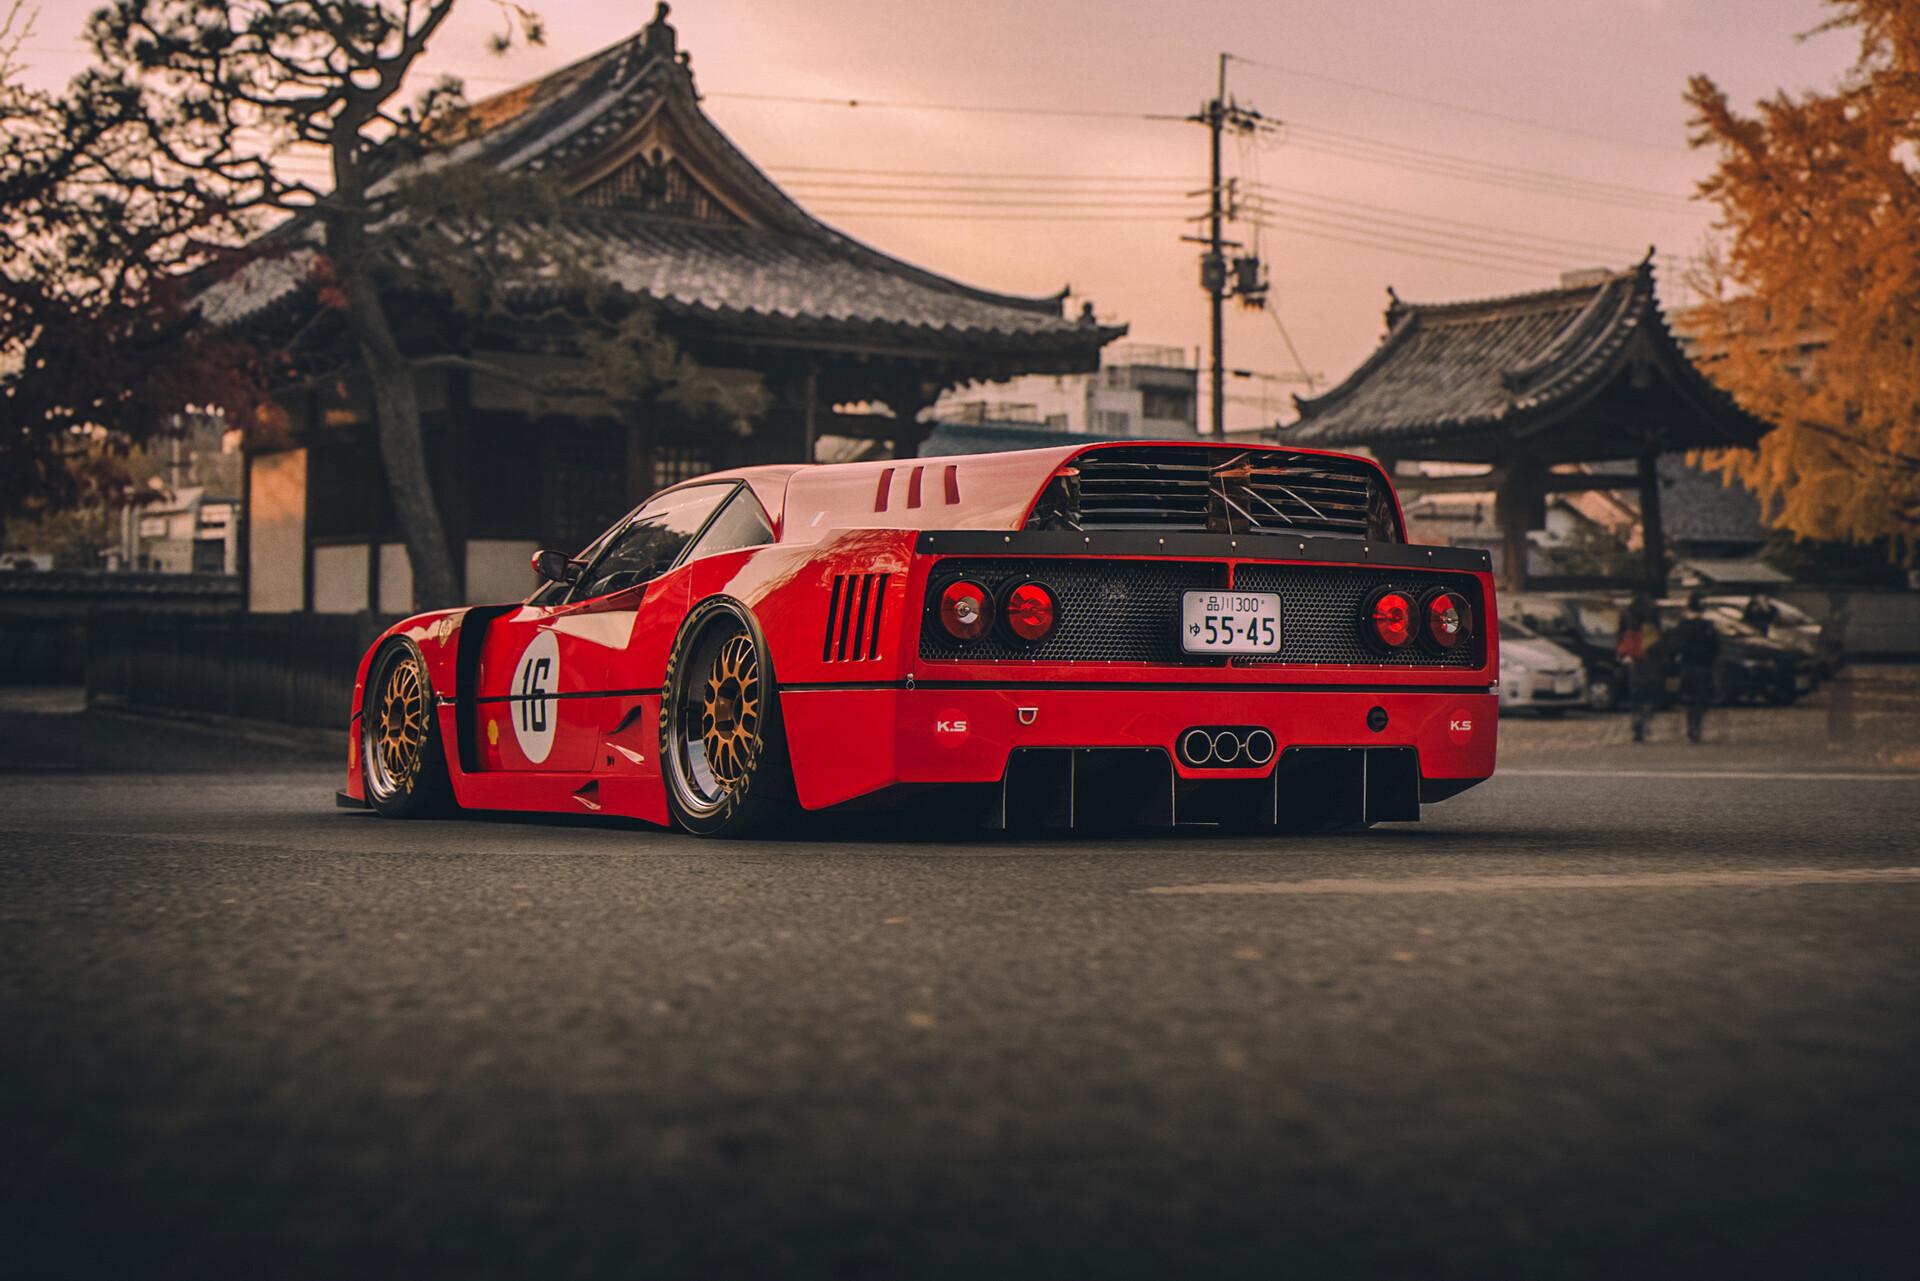 Hintergrundbilder Ferrari F40 Japan 1920x1281 Brycied00d 1551201 Hintergrundbilder Wallhere